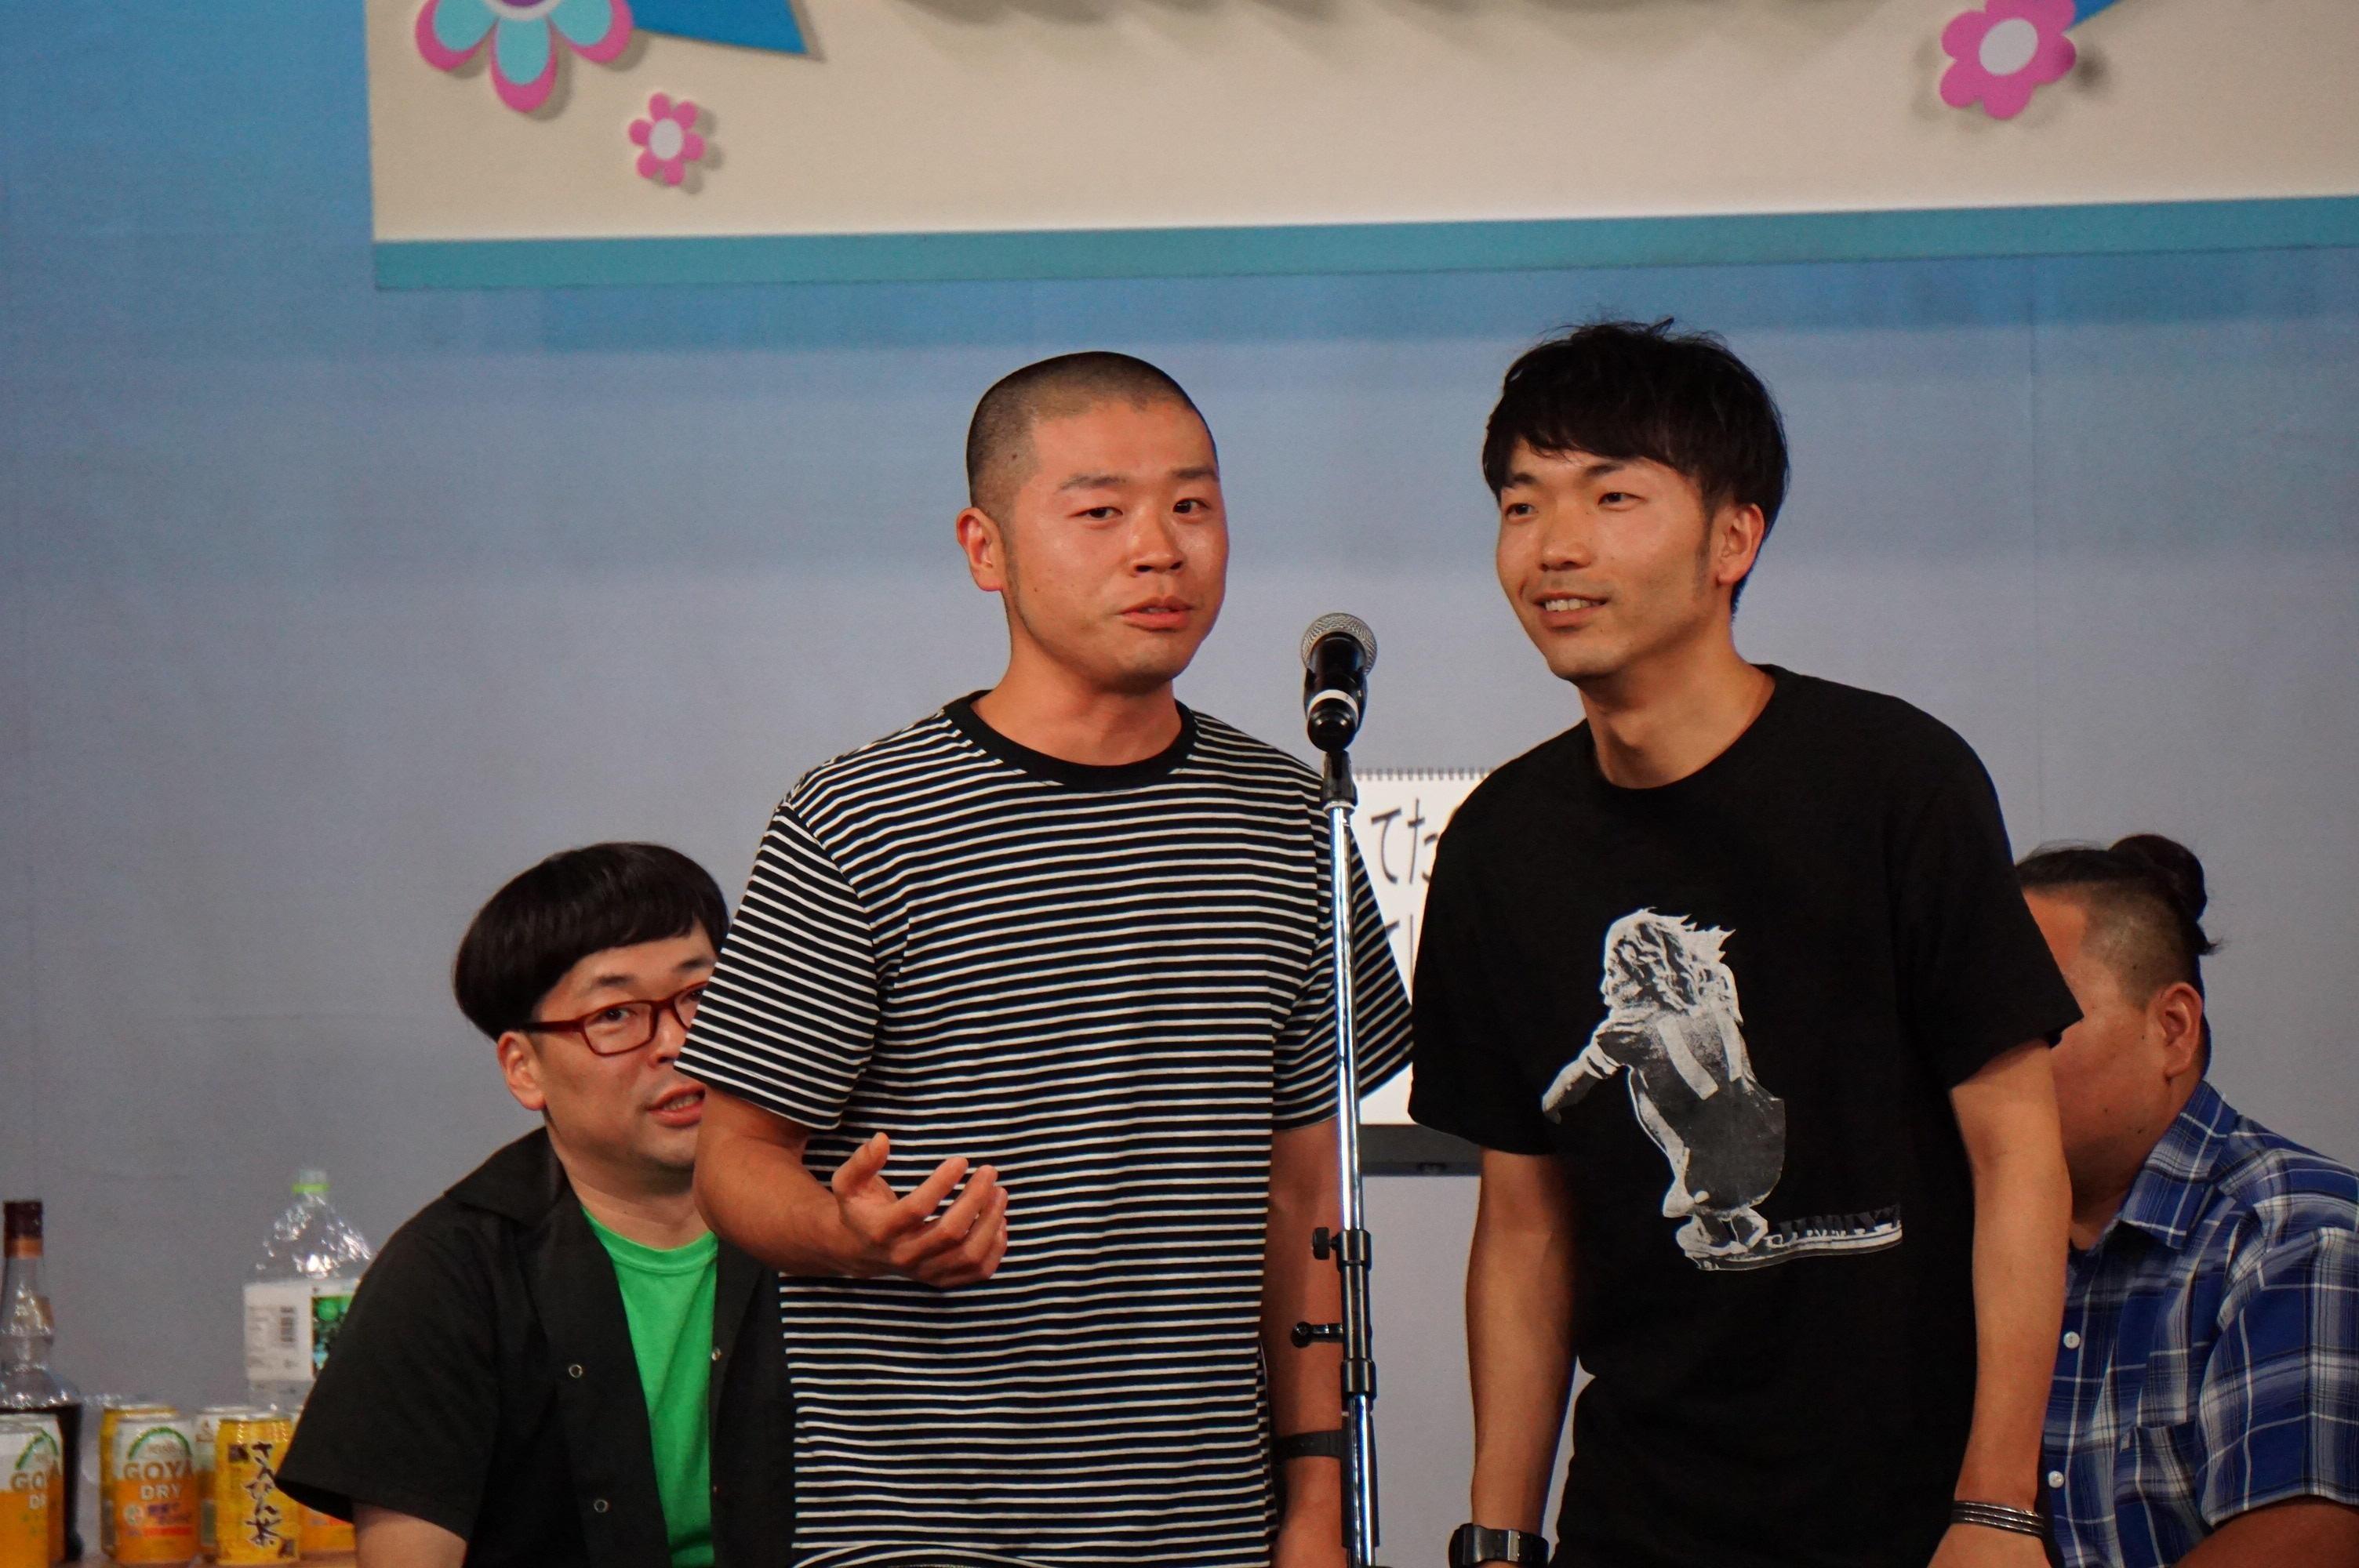 http://news.yoshimoto.co.jp/20161030180325-6741c81285afef383745952778e668efc2505b75.jpg